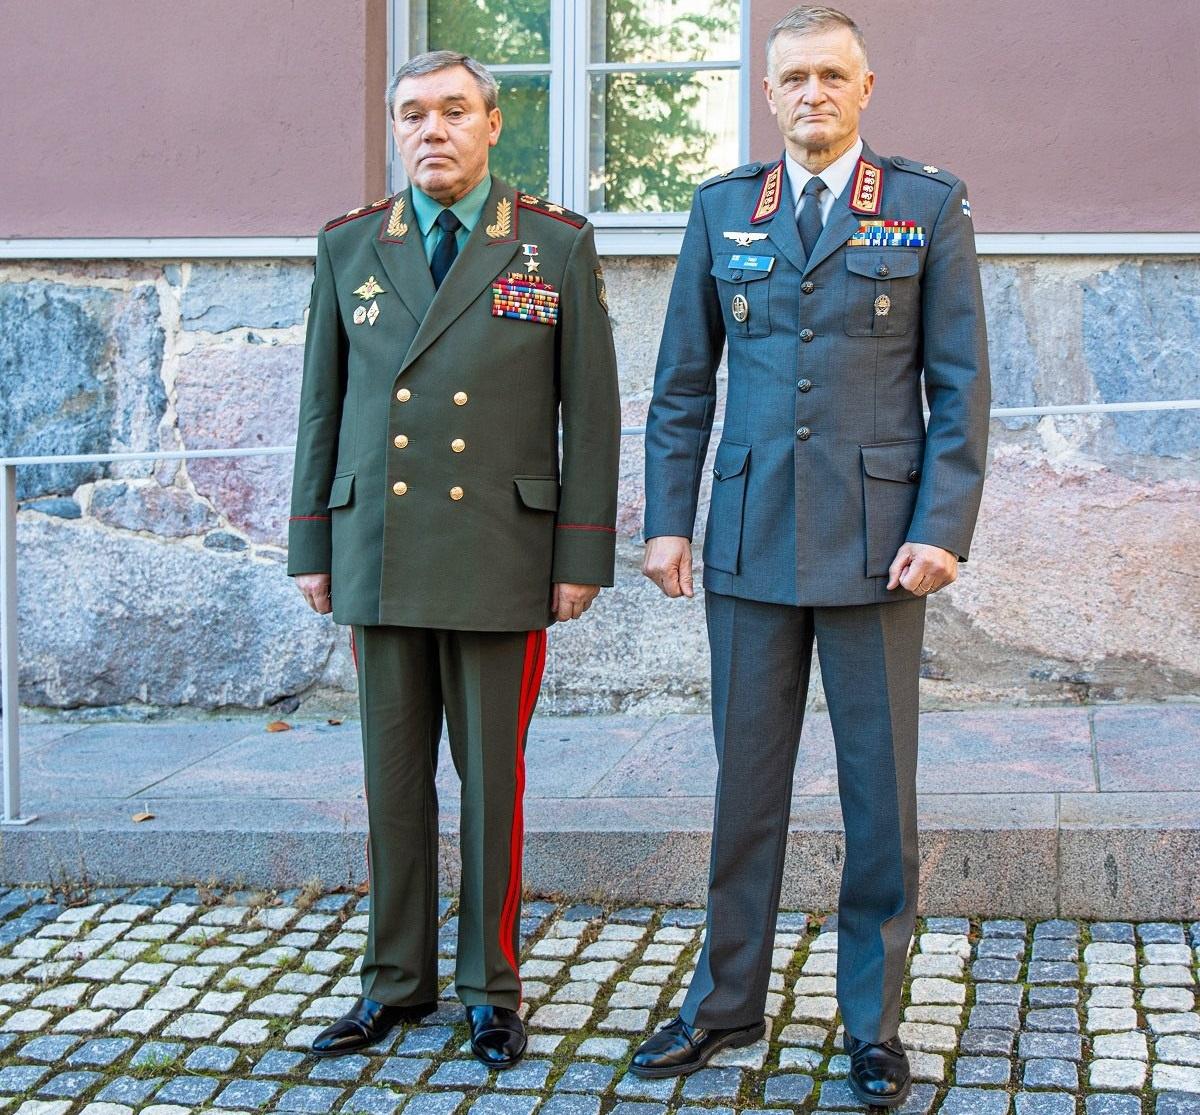 Finnish Chief of Defence General Timo Kivinen and Chief of the General Staff of the Armed Forces of Russia, General Valeri Gerasimov